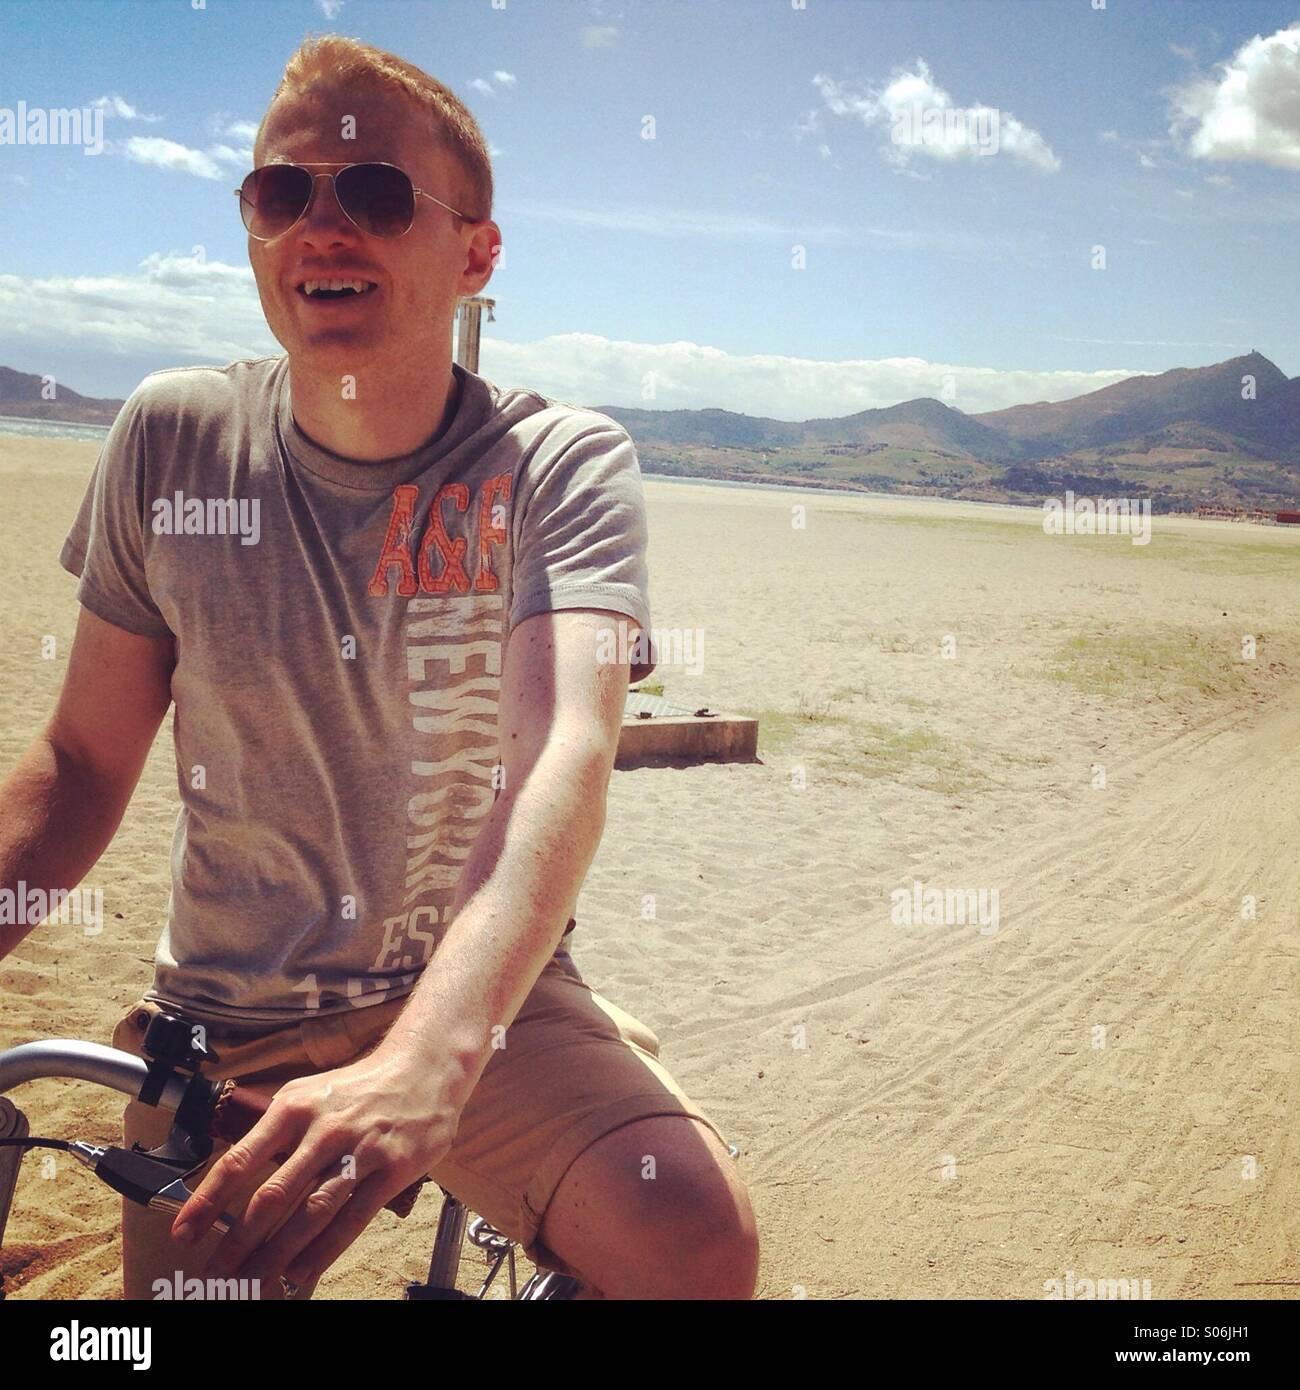 Mann mit Fahrrad am Strand Stockbild